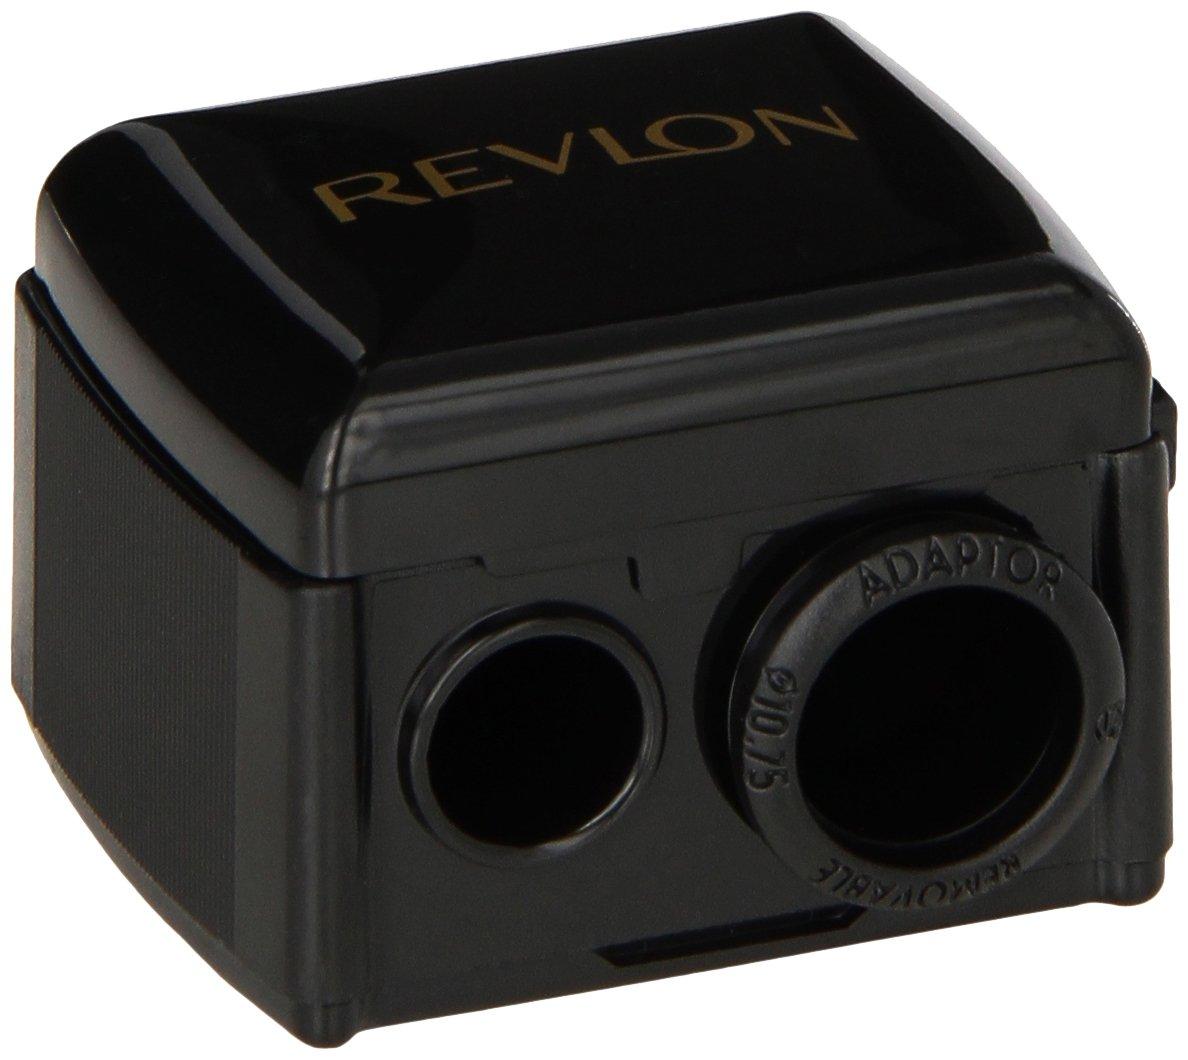 Revlon Universal Points Sharpener, Dual Pencil Sharpener for Lip Liner, Eyebrow, and Eyeliner Pencils